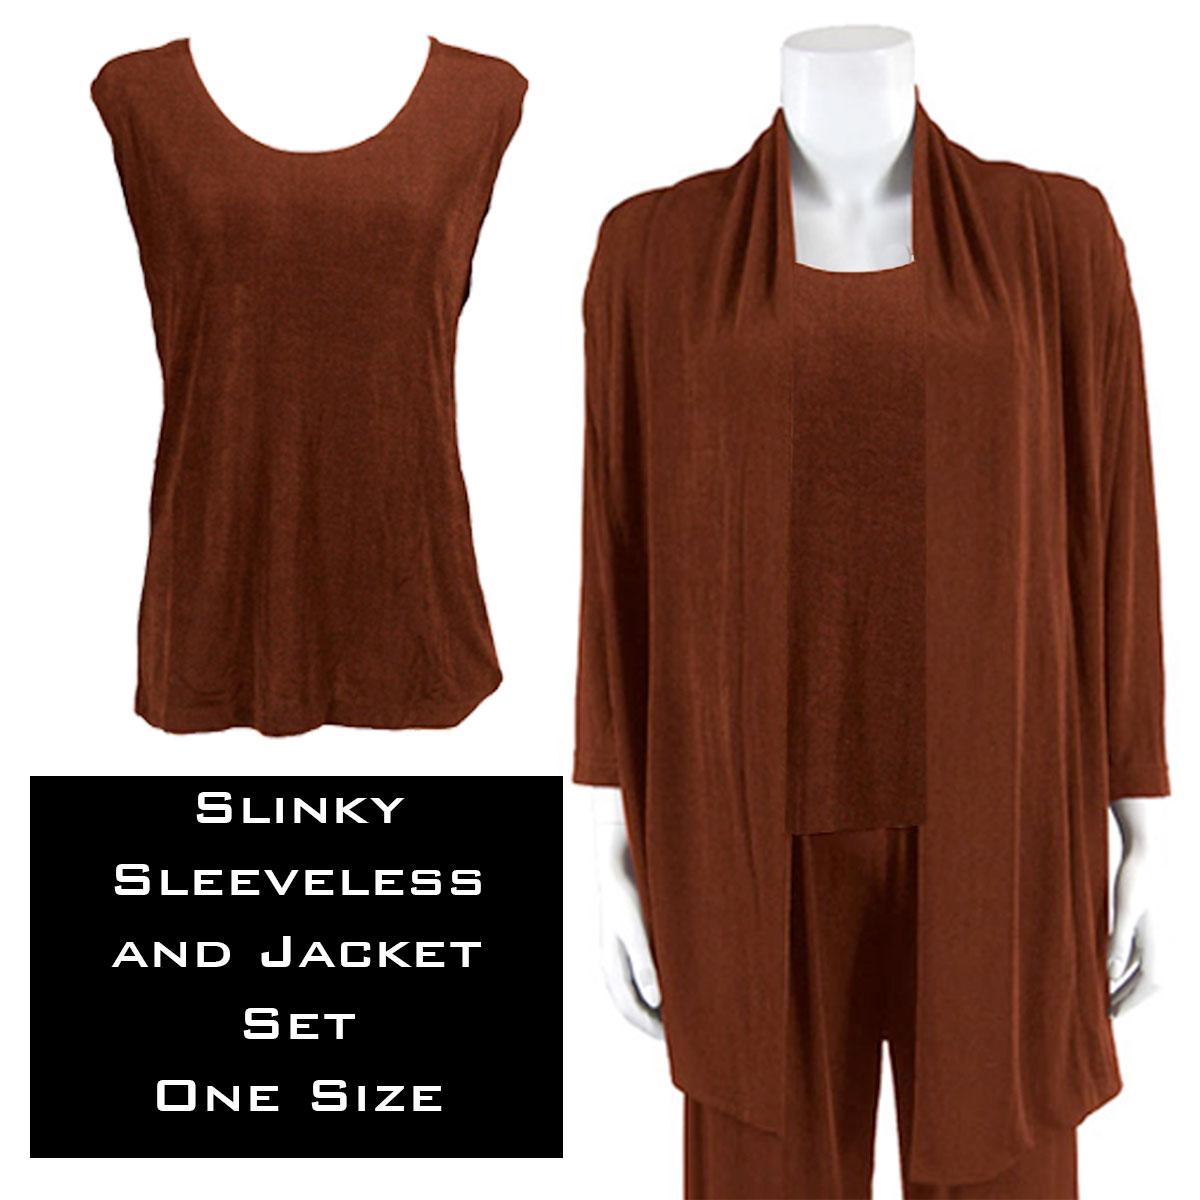 Slinky Jacket Set - BROWN Slinky Jacket Set